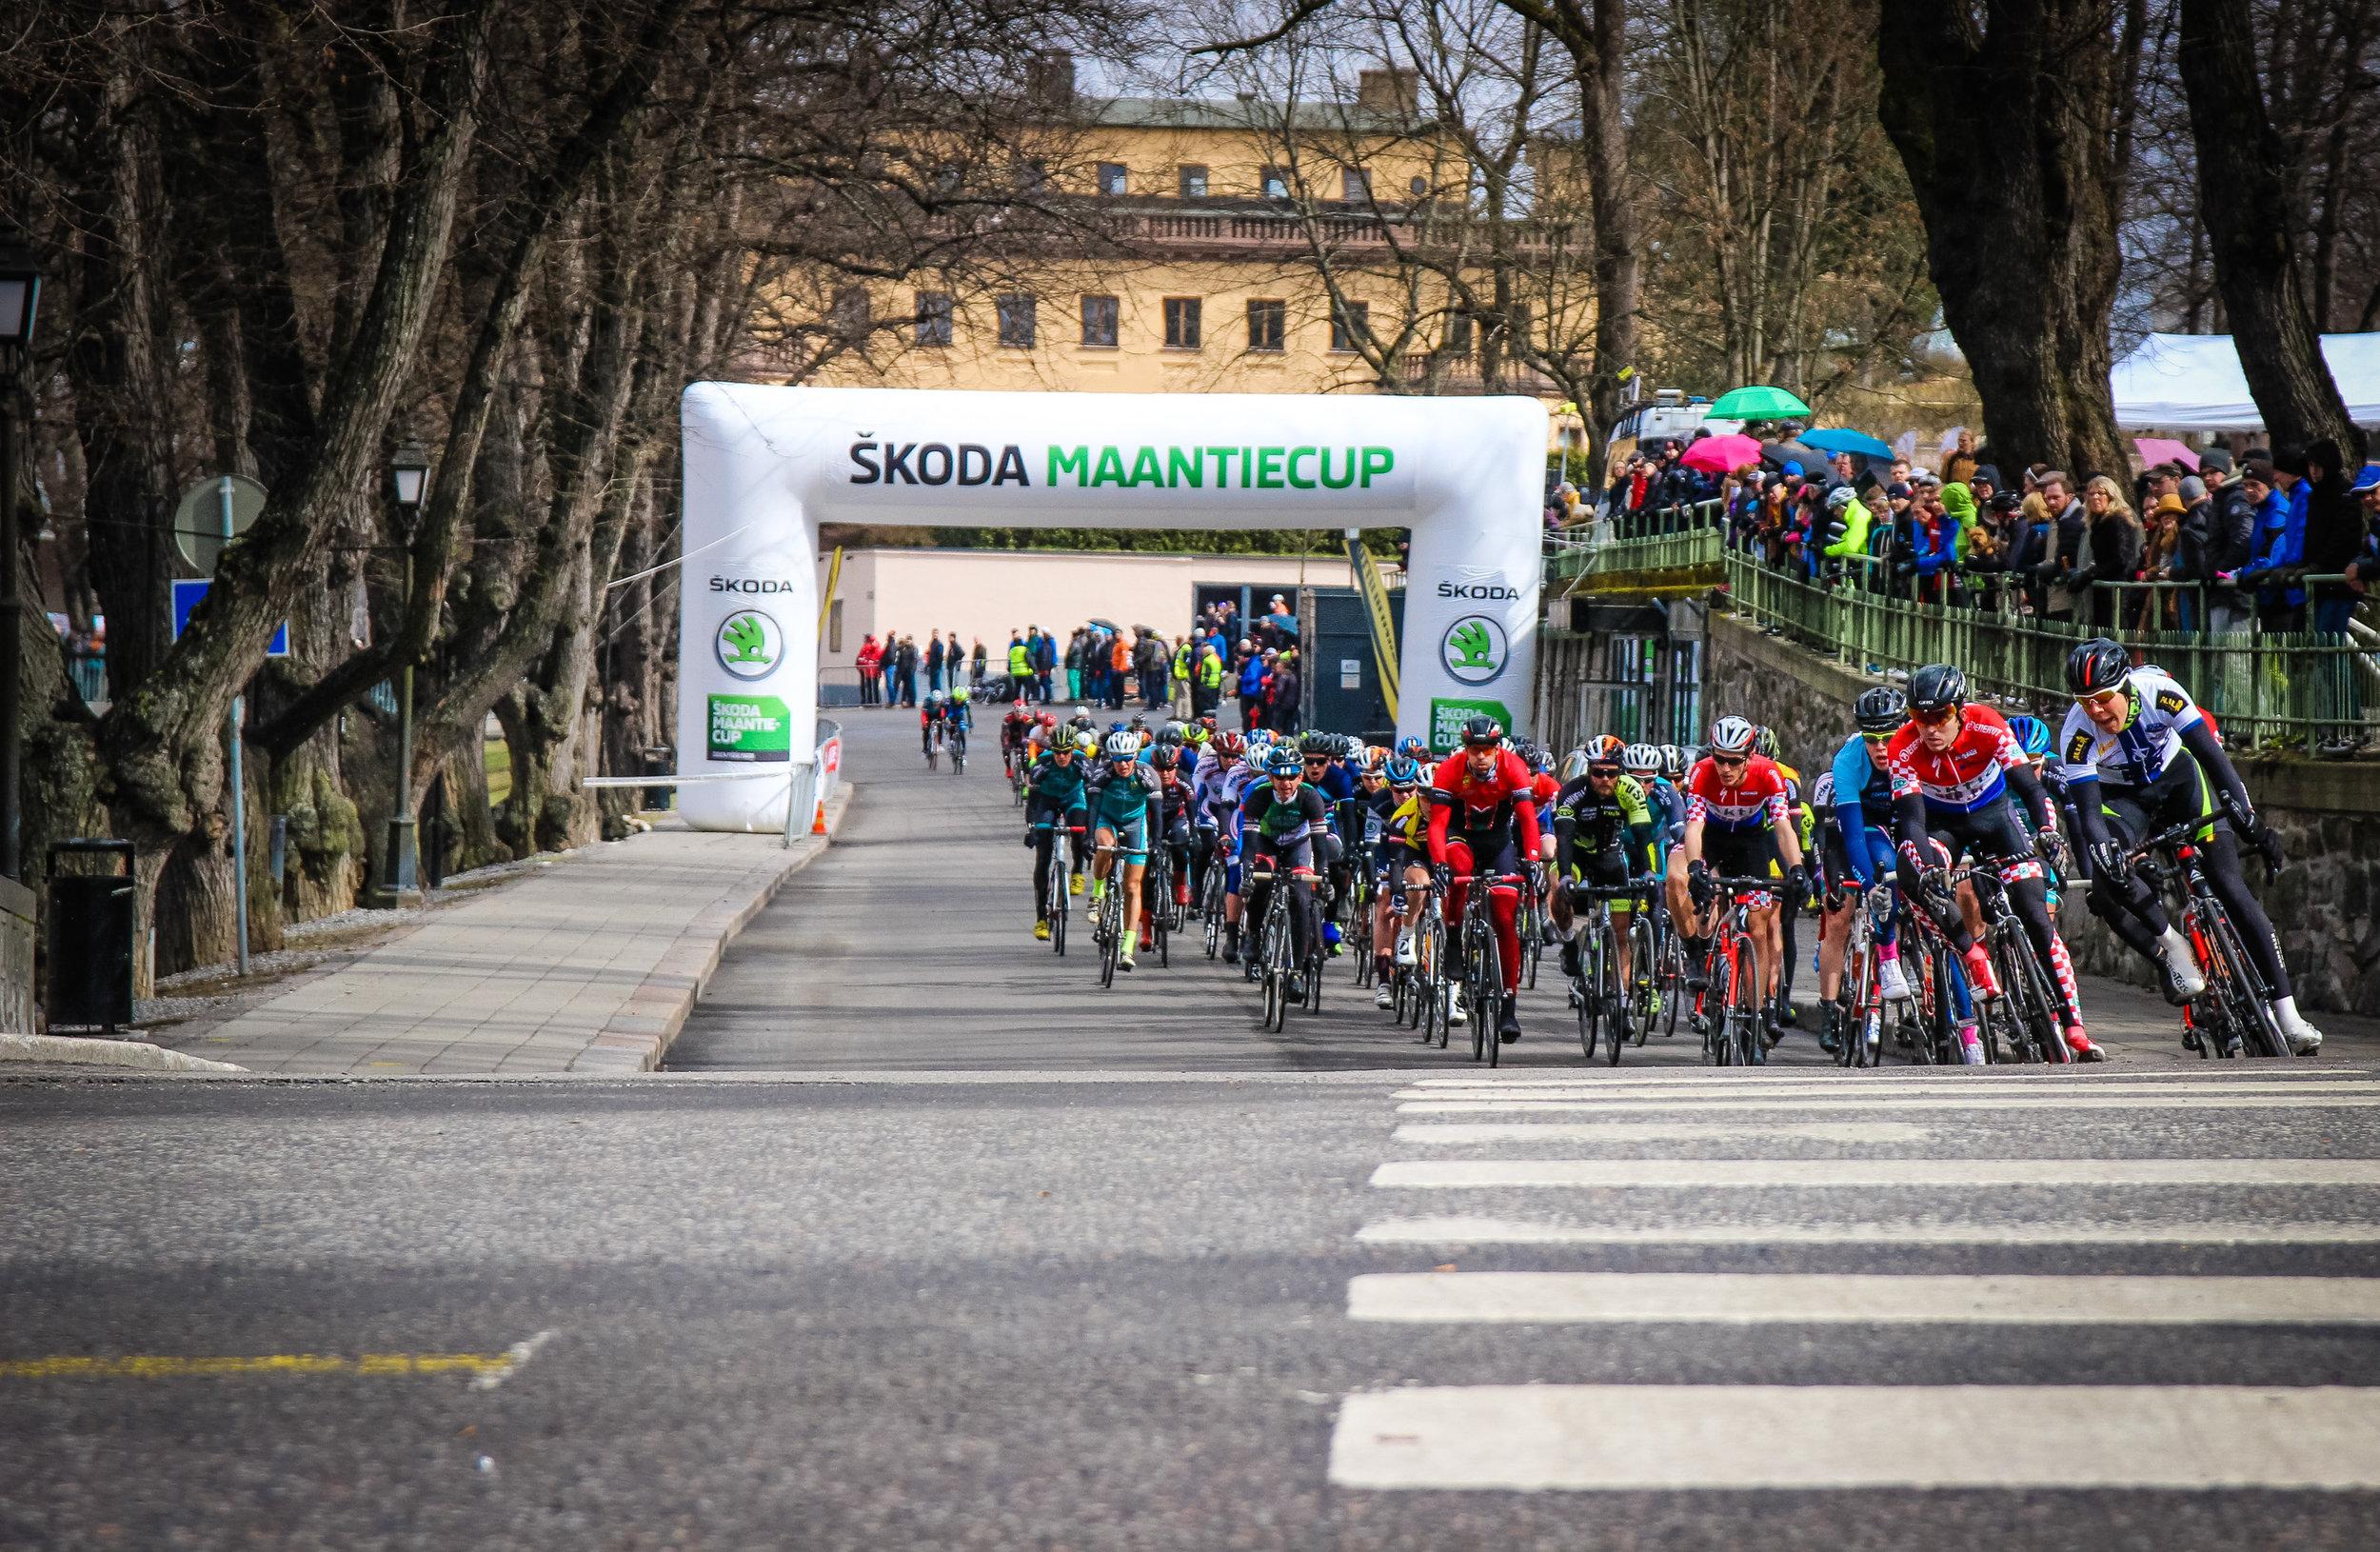 Skoda Maantiecup started with the TS Kortteliajot